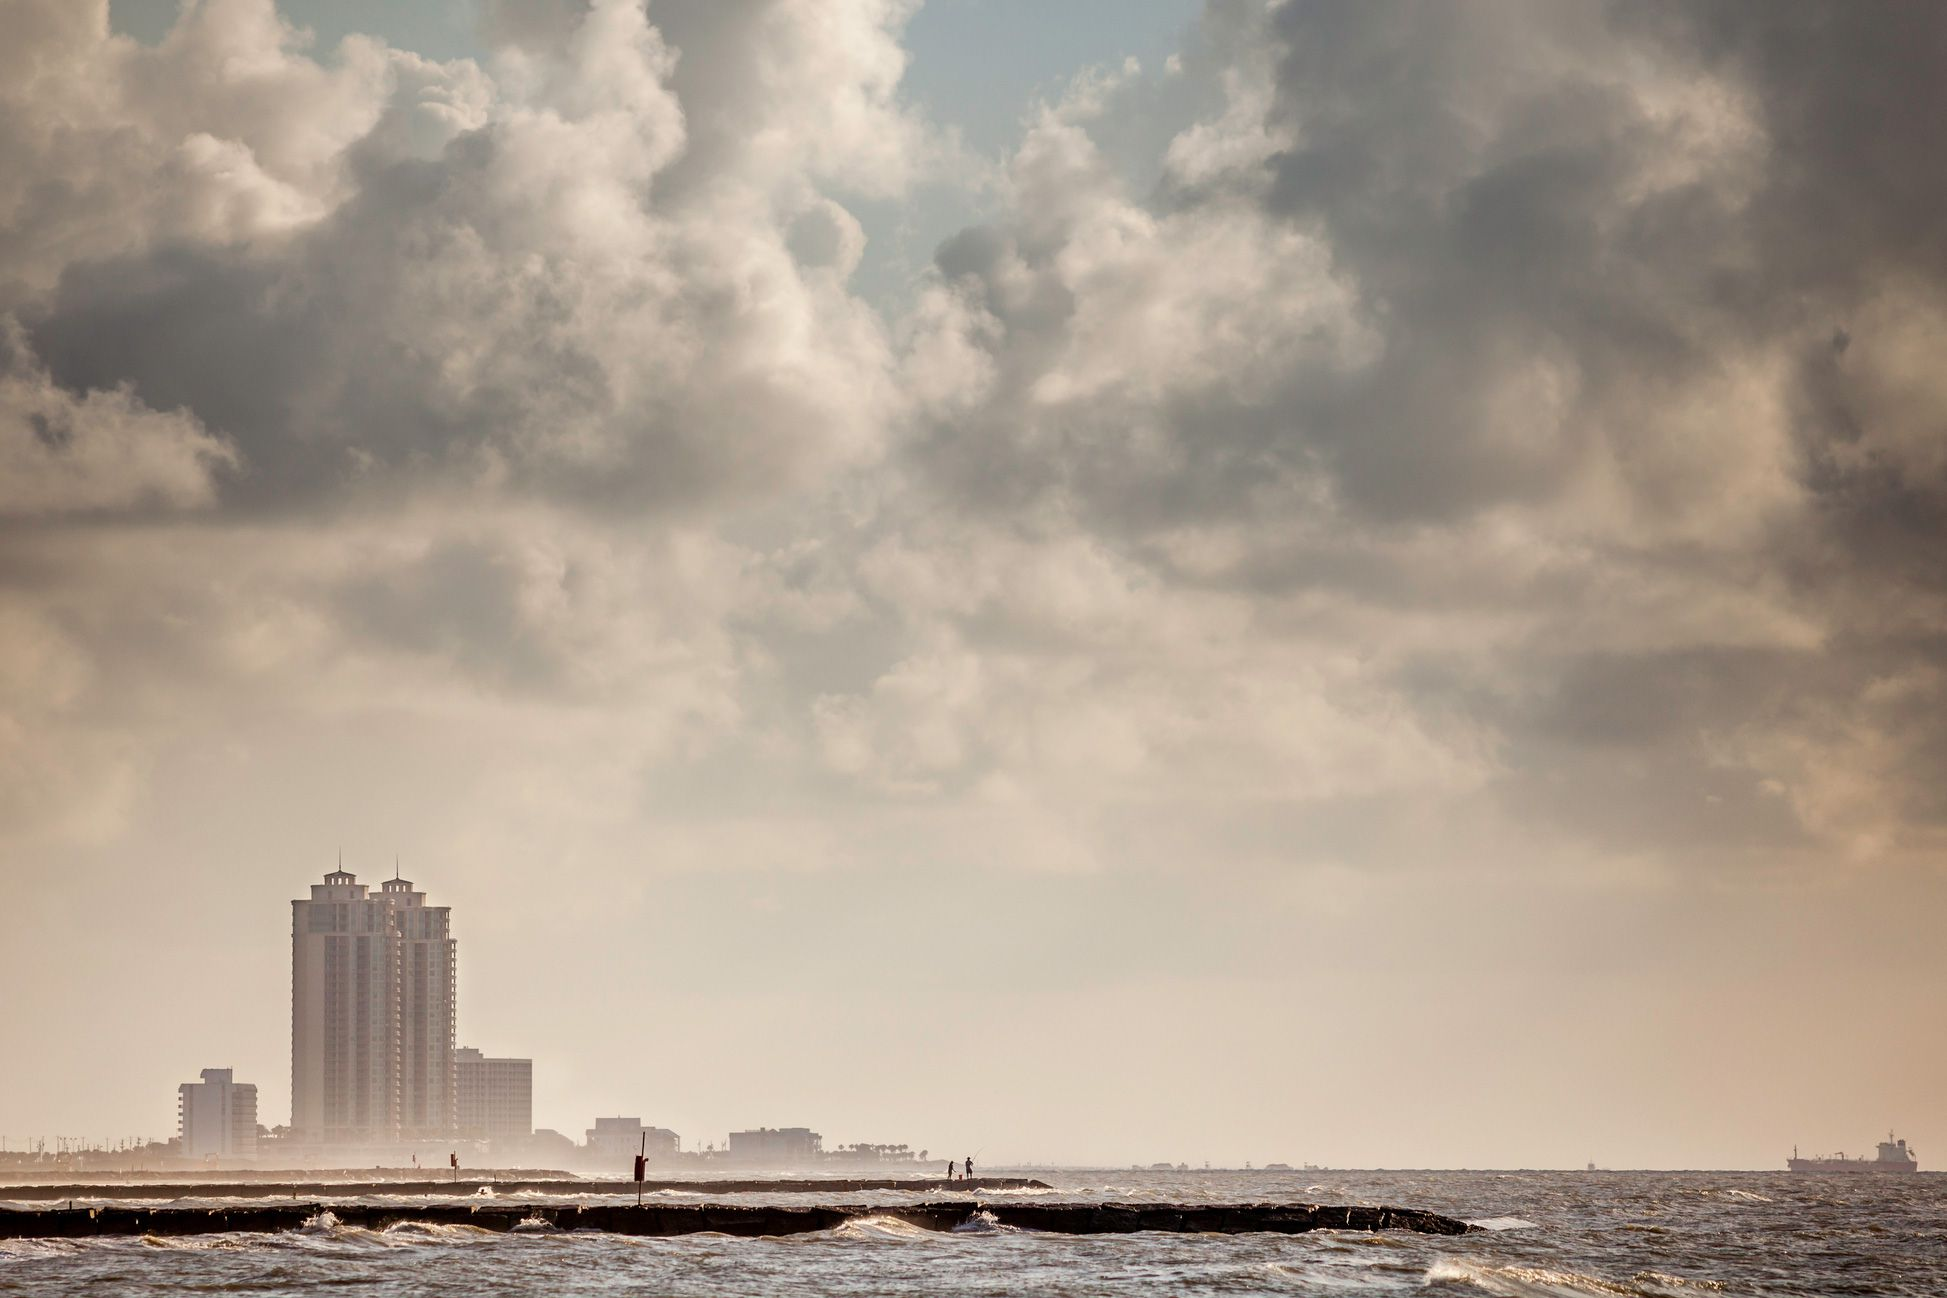 Tips For Visiting The Texas Coast During Hurricane Season